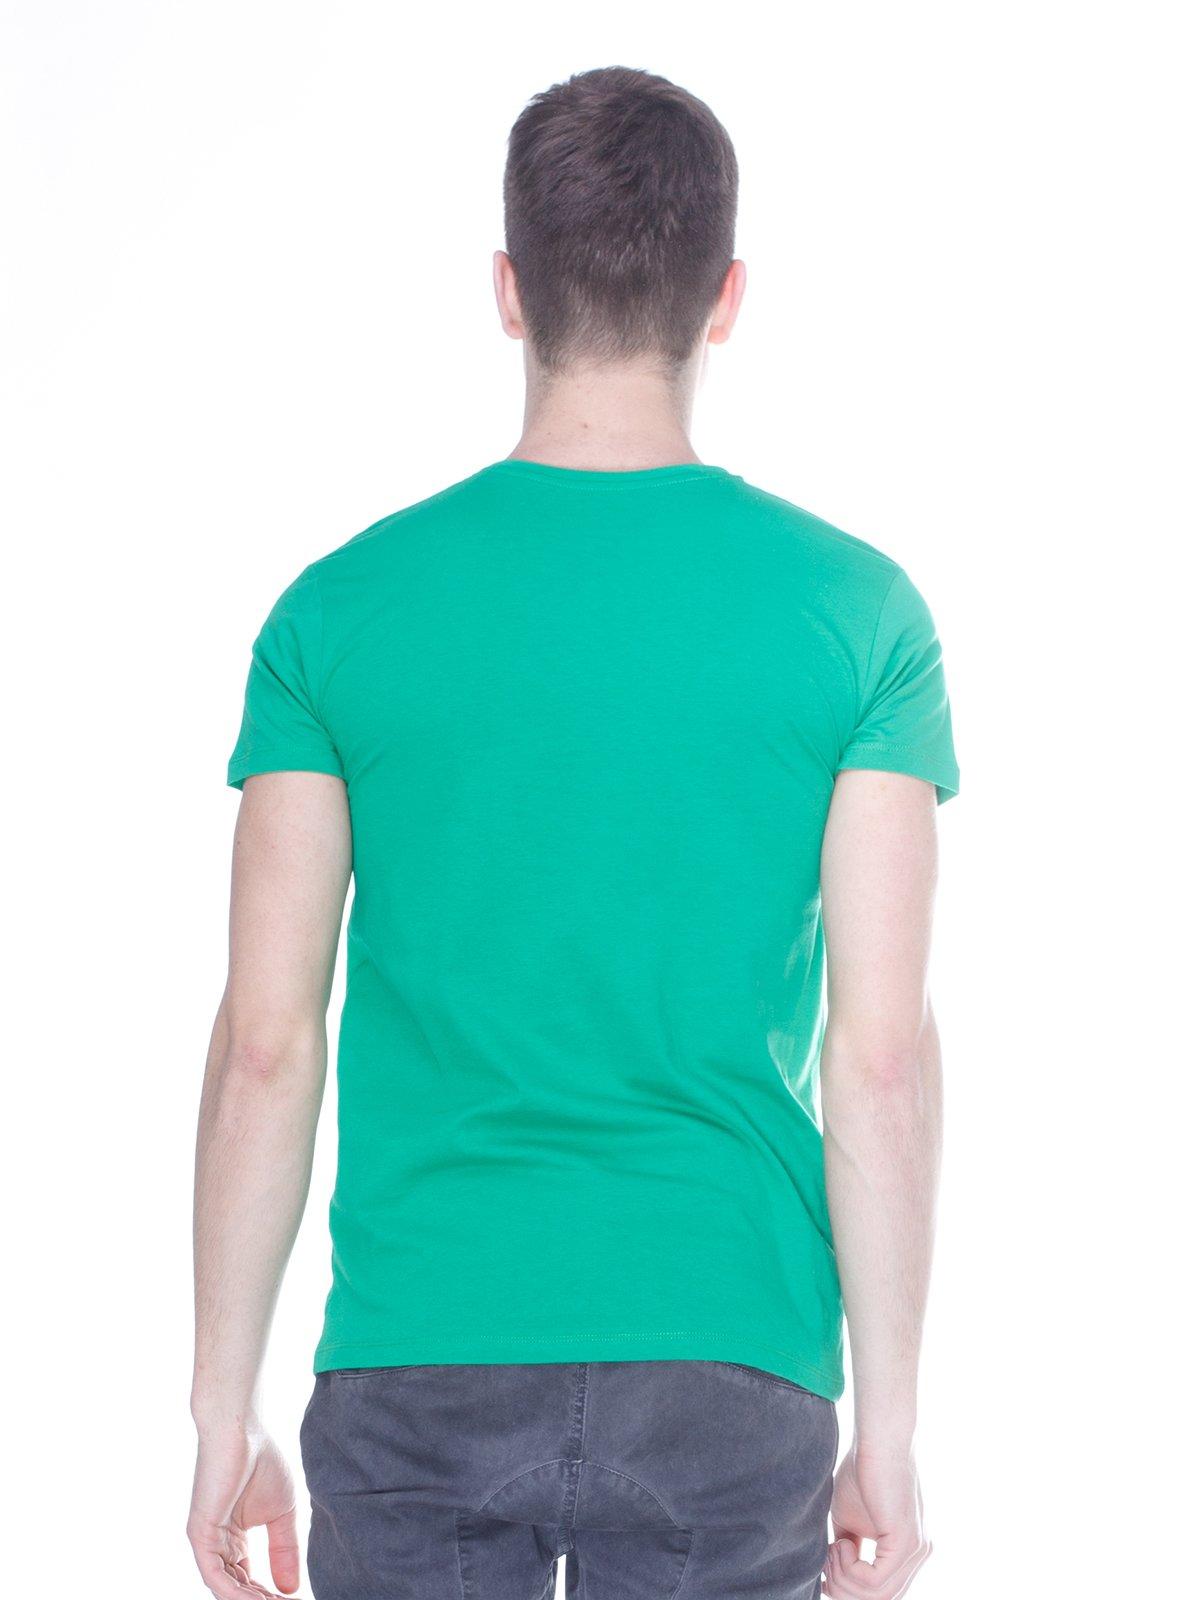 Футболка зелена | 3178541 | фото 2